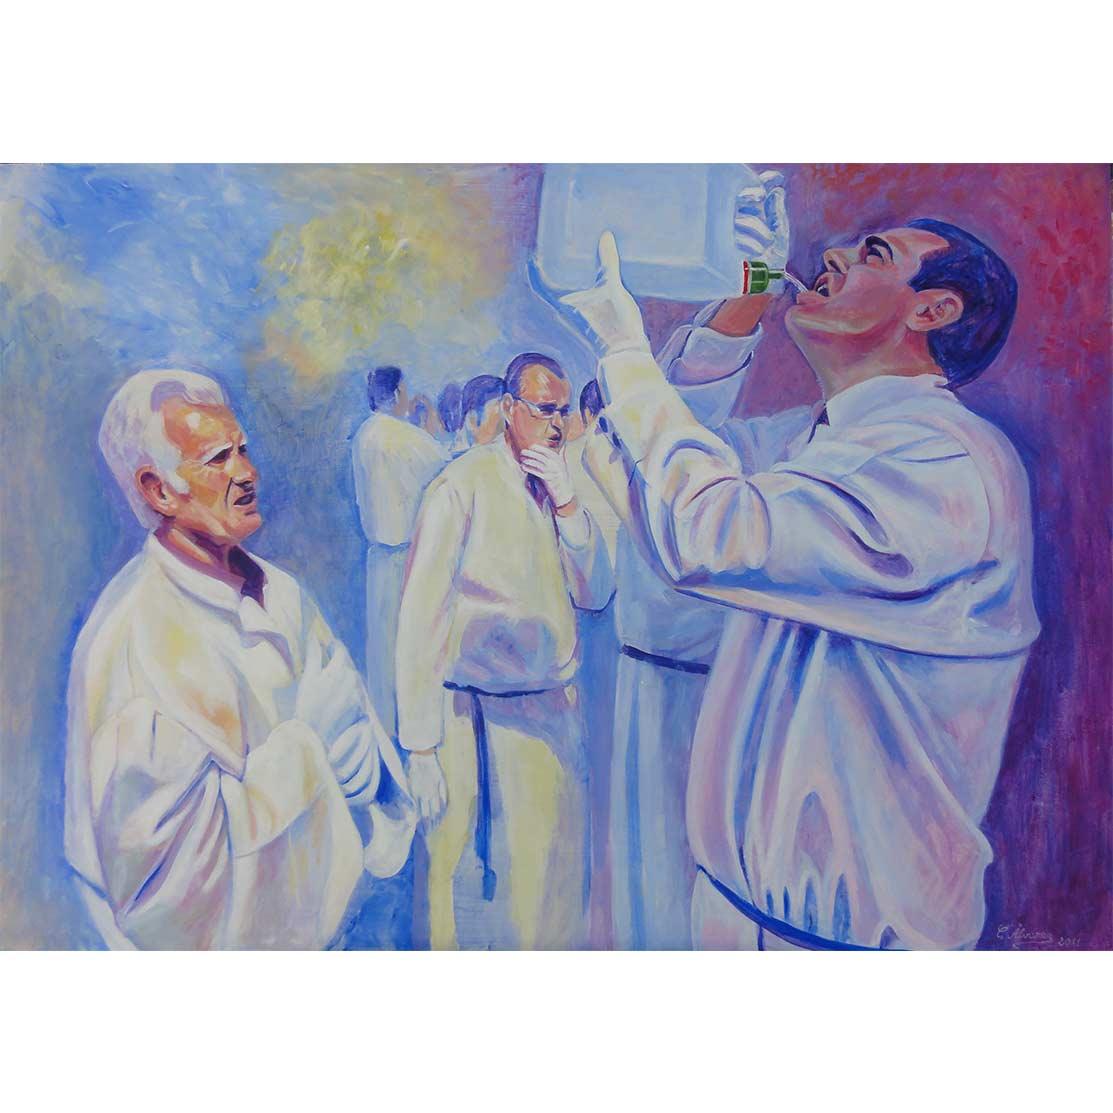 DRINKING WATER Acrylic on panel 65 x 90 cm